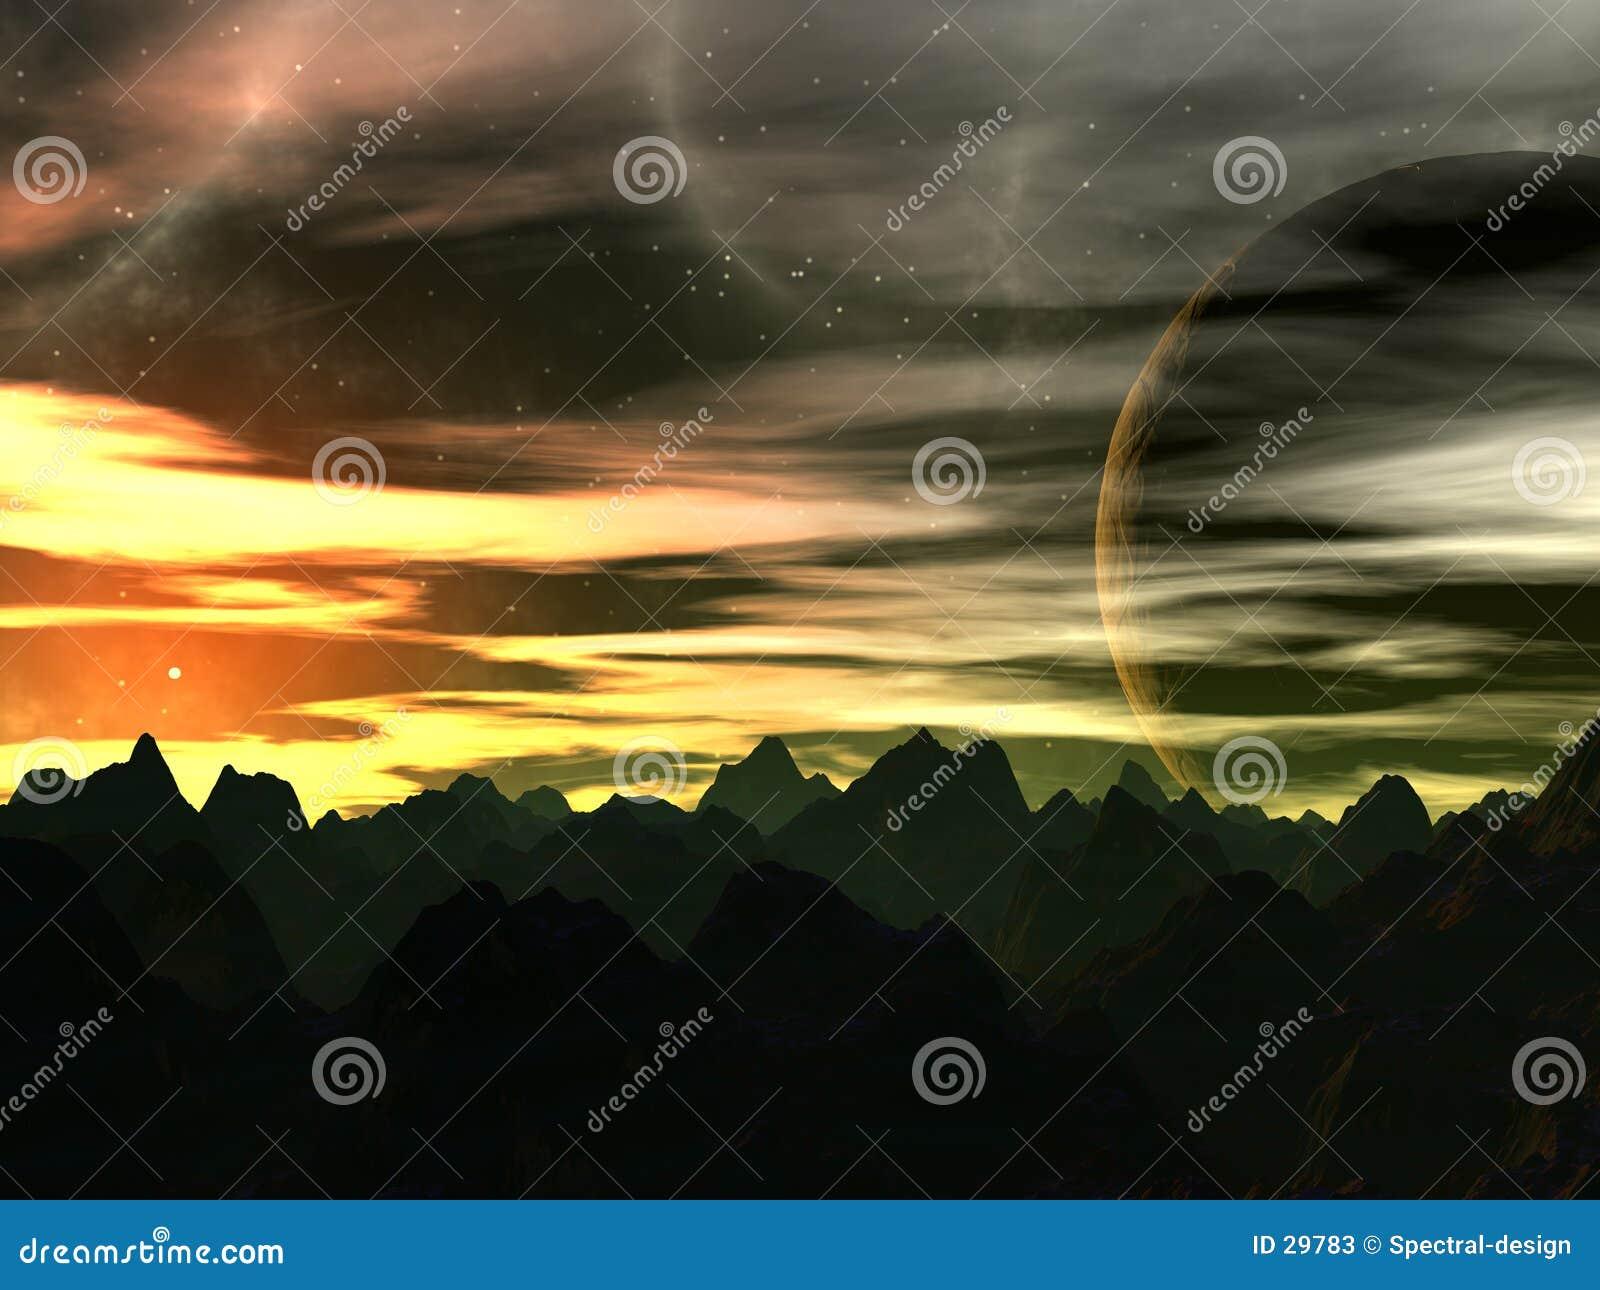 Download 8 xilis ηλιοβασιλέματος απεικόνιση αποθεμάτων. εικονογραφία από ατμόσφαιρας - 29783